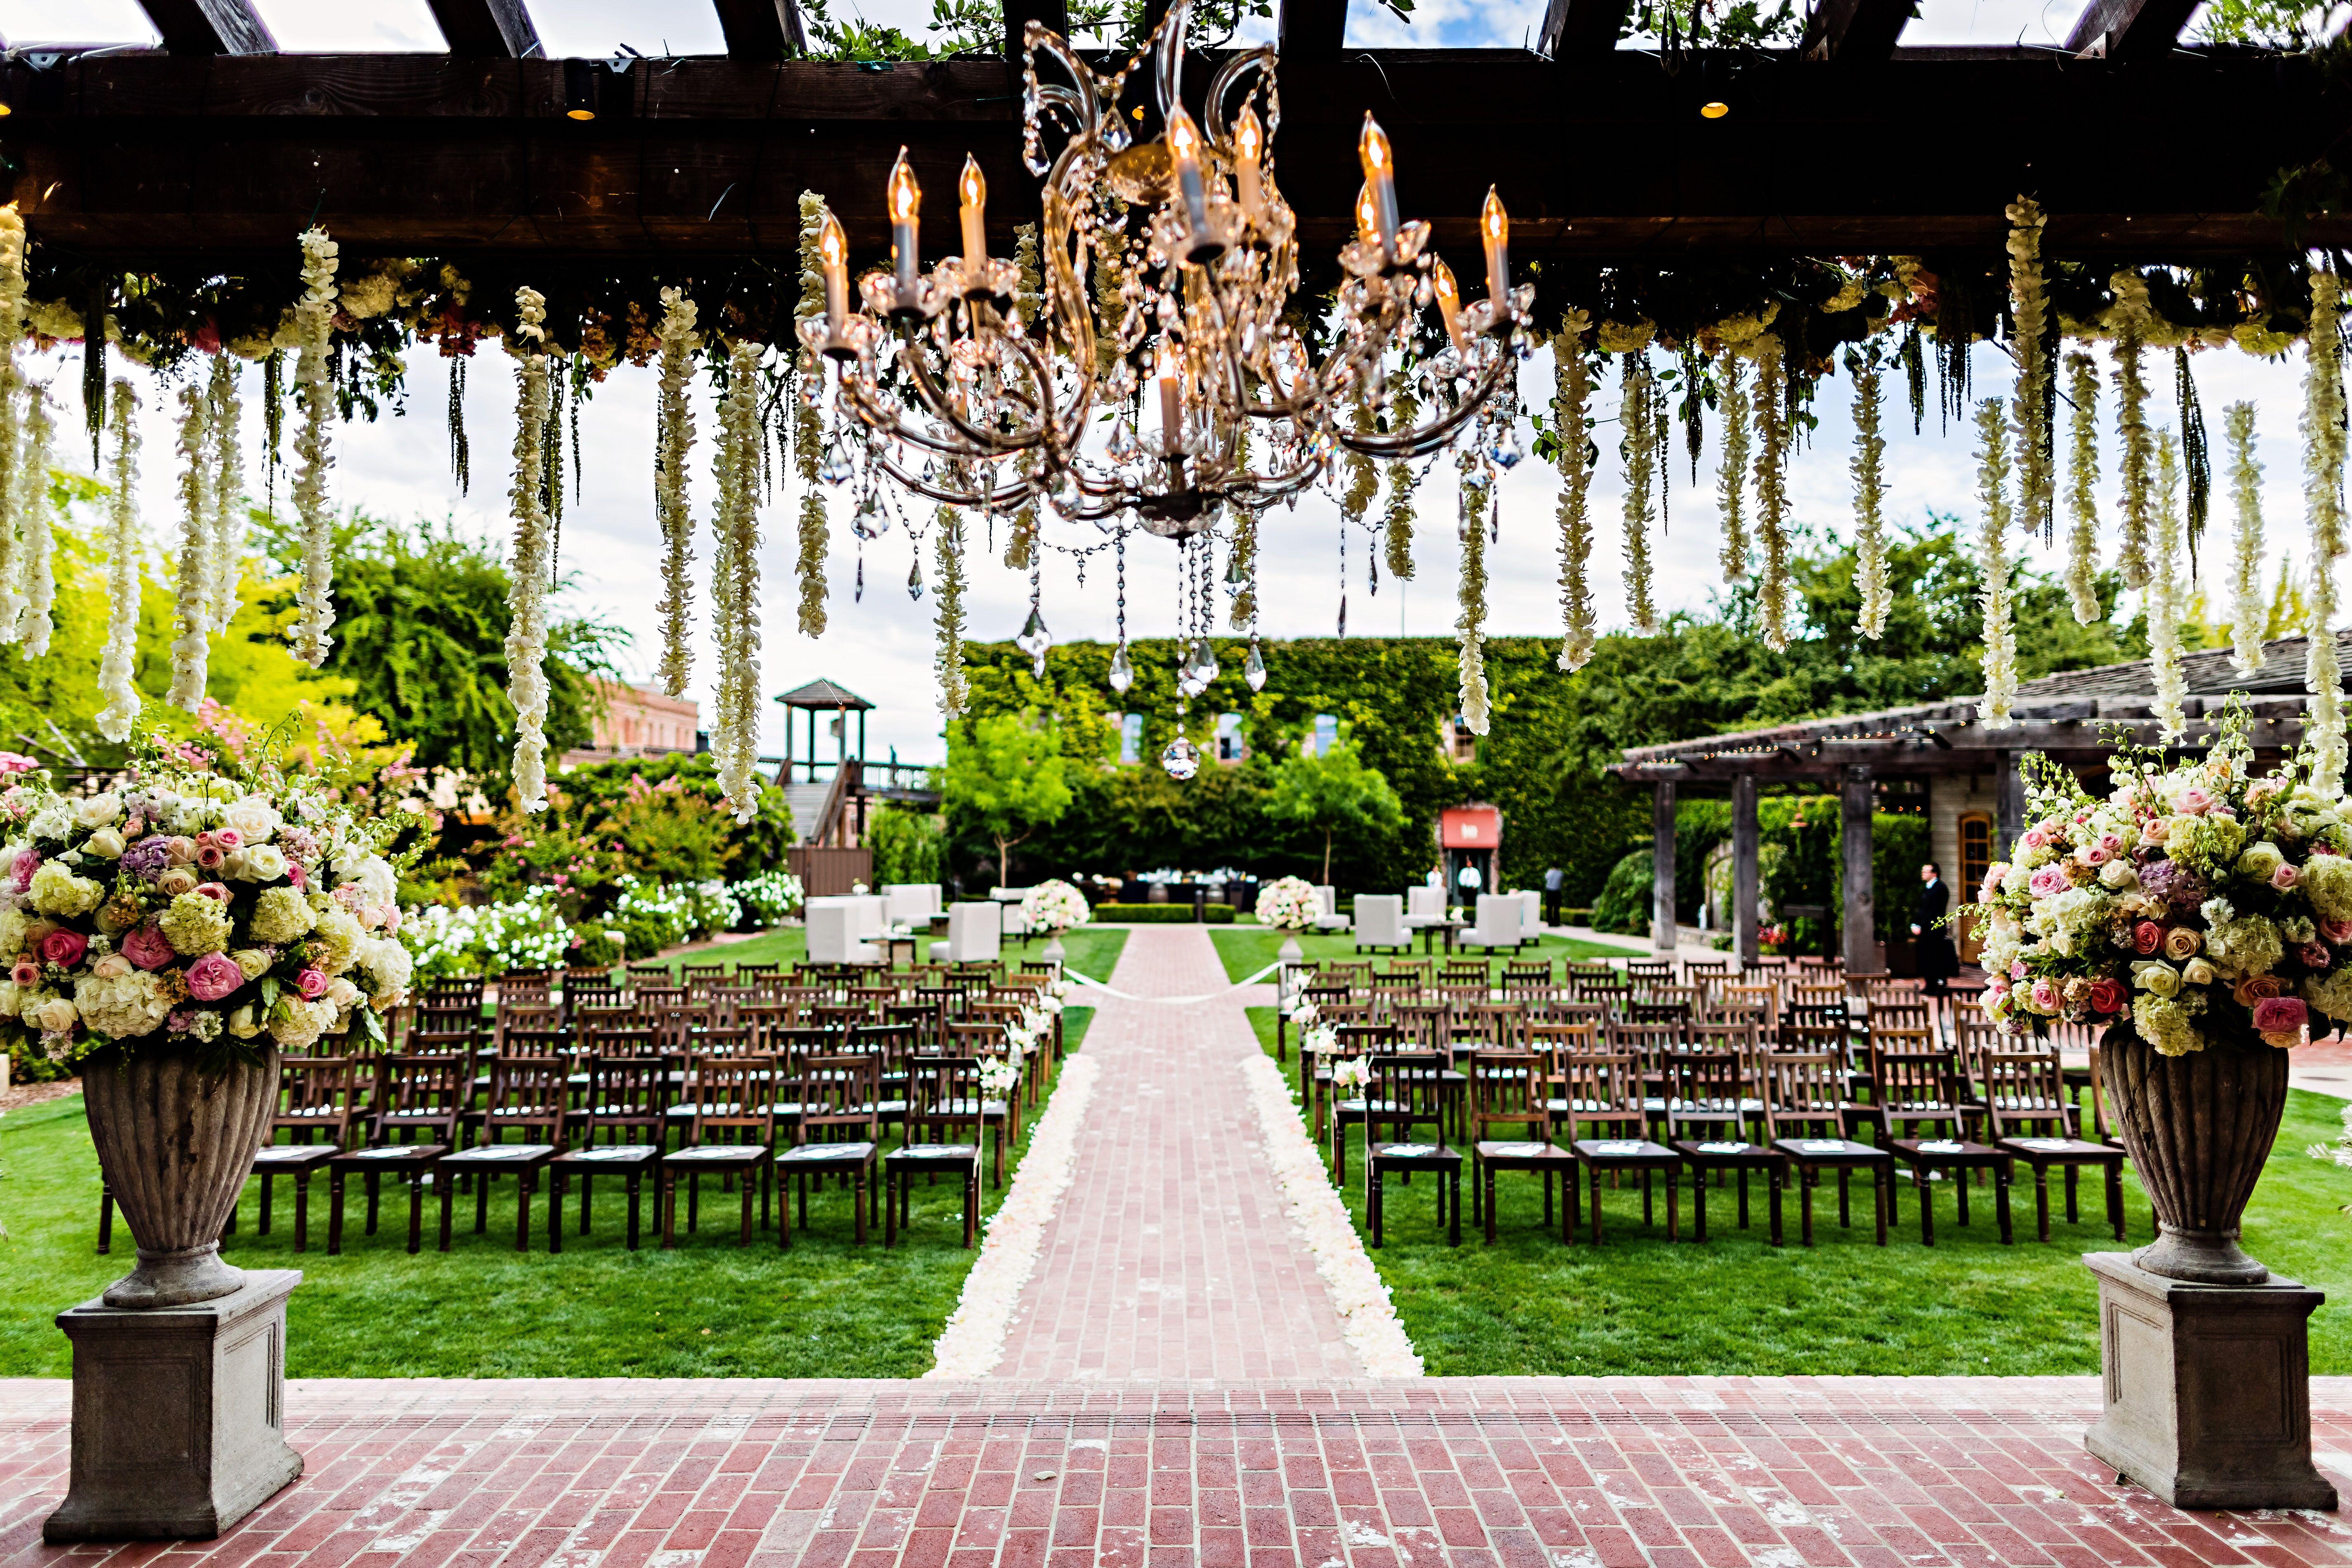 Outdoor Weddings Brazos Valley Wedding Planning: The Estate Yountville